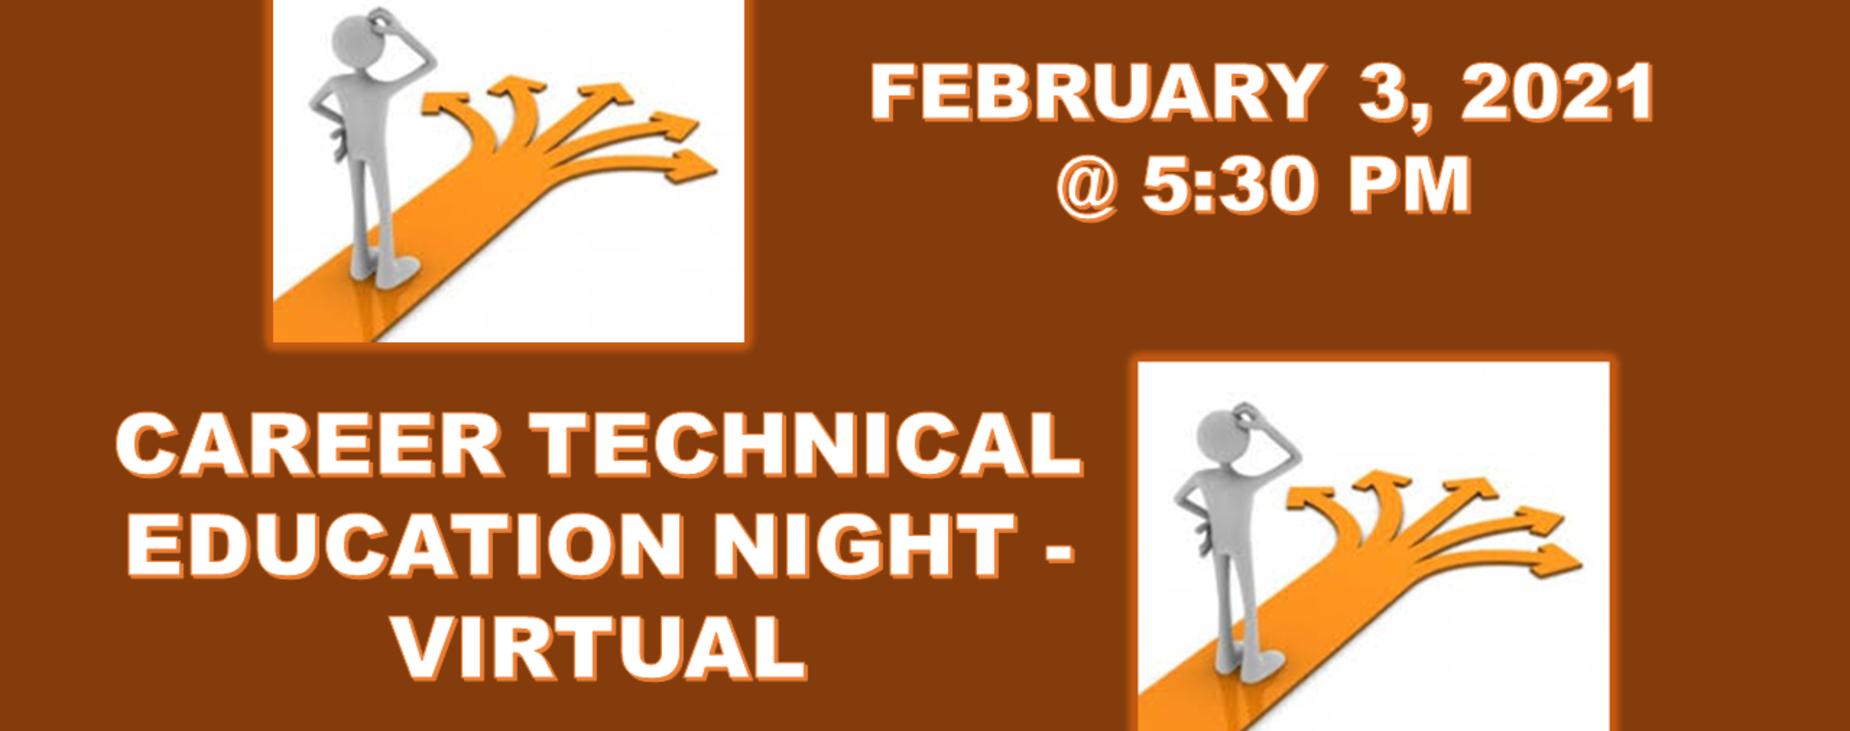 Career Technical Education Night